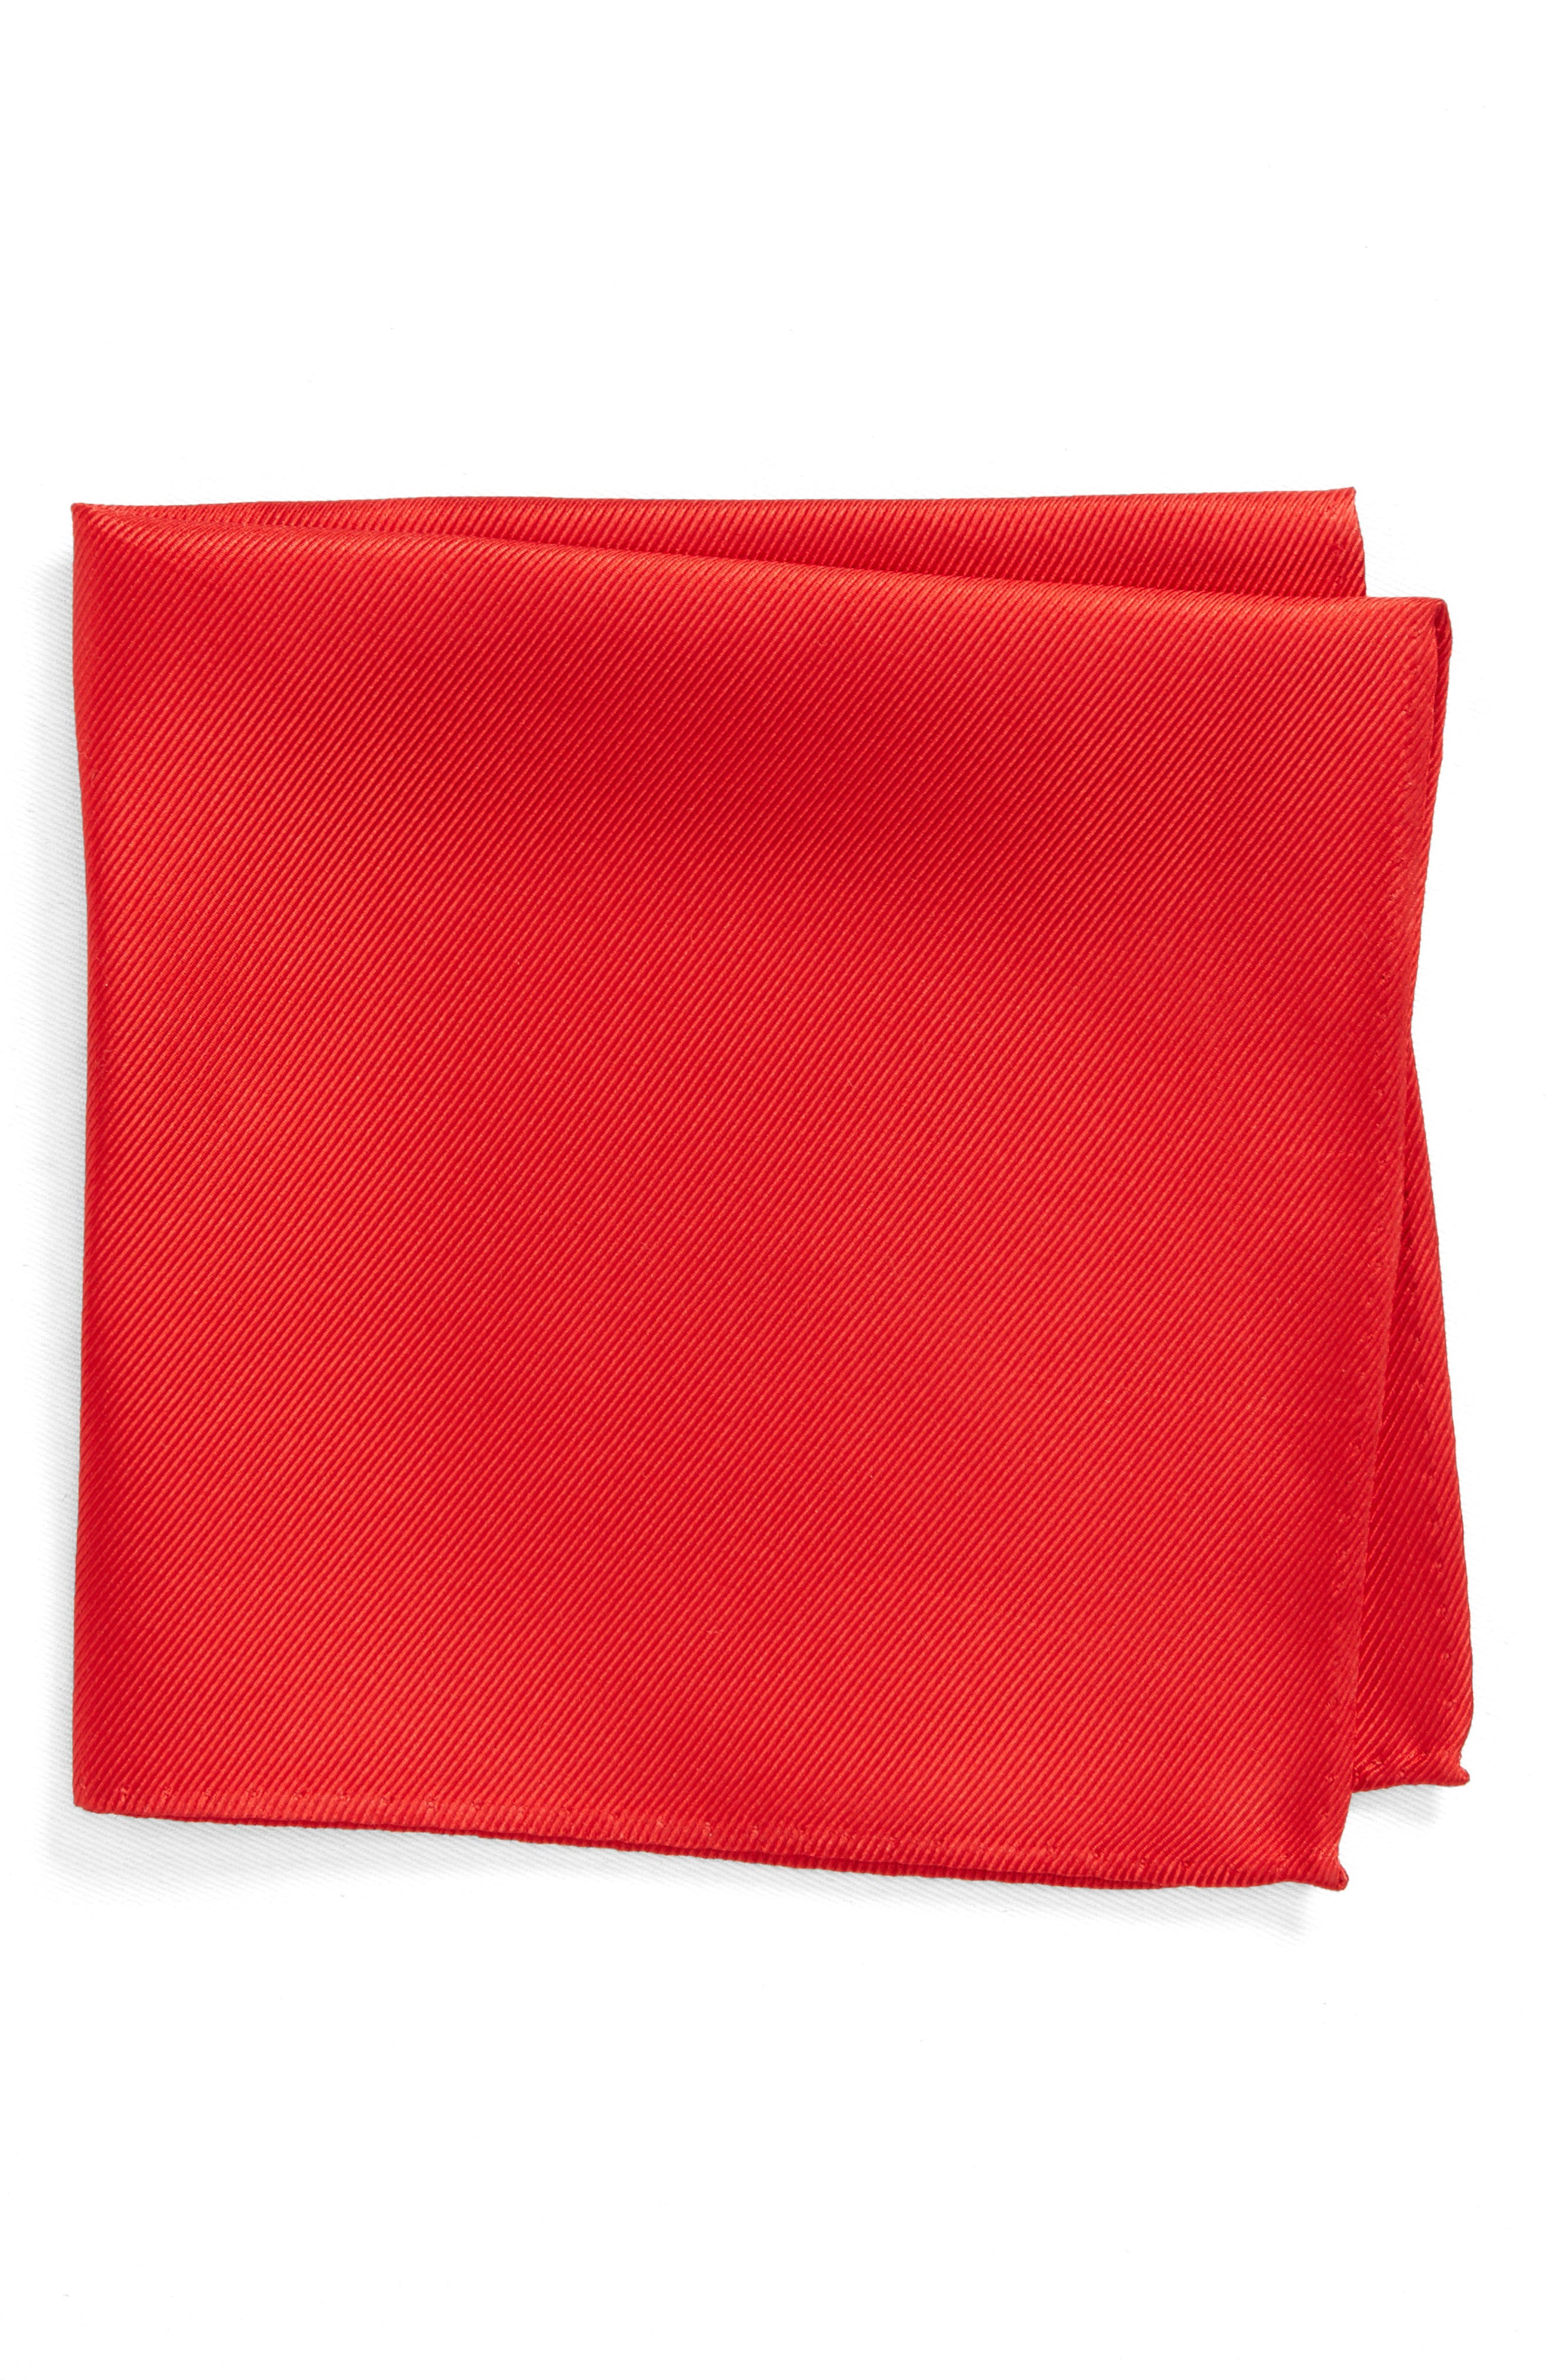 King Twill Silk Pocket Square,                             Main thumbnail 1, color,                             Red